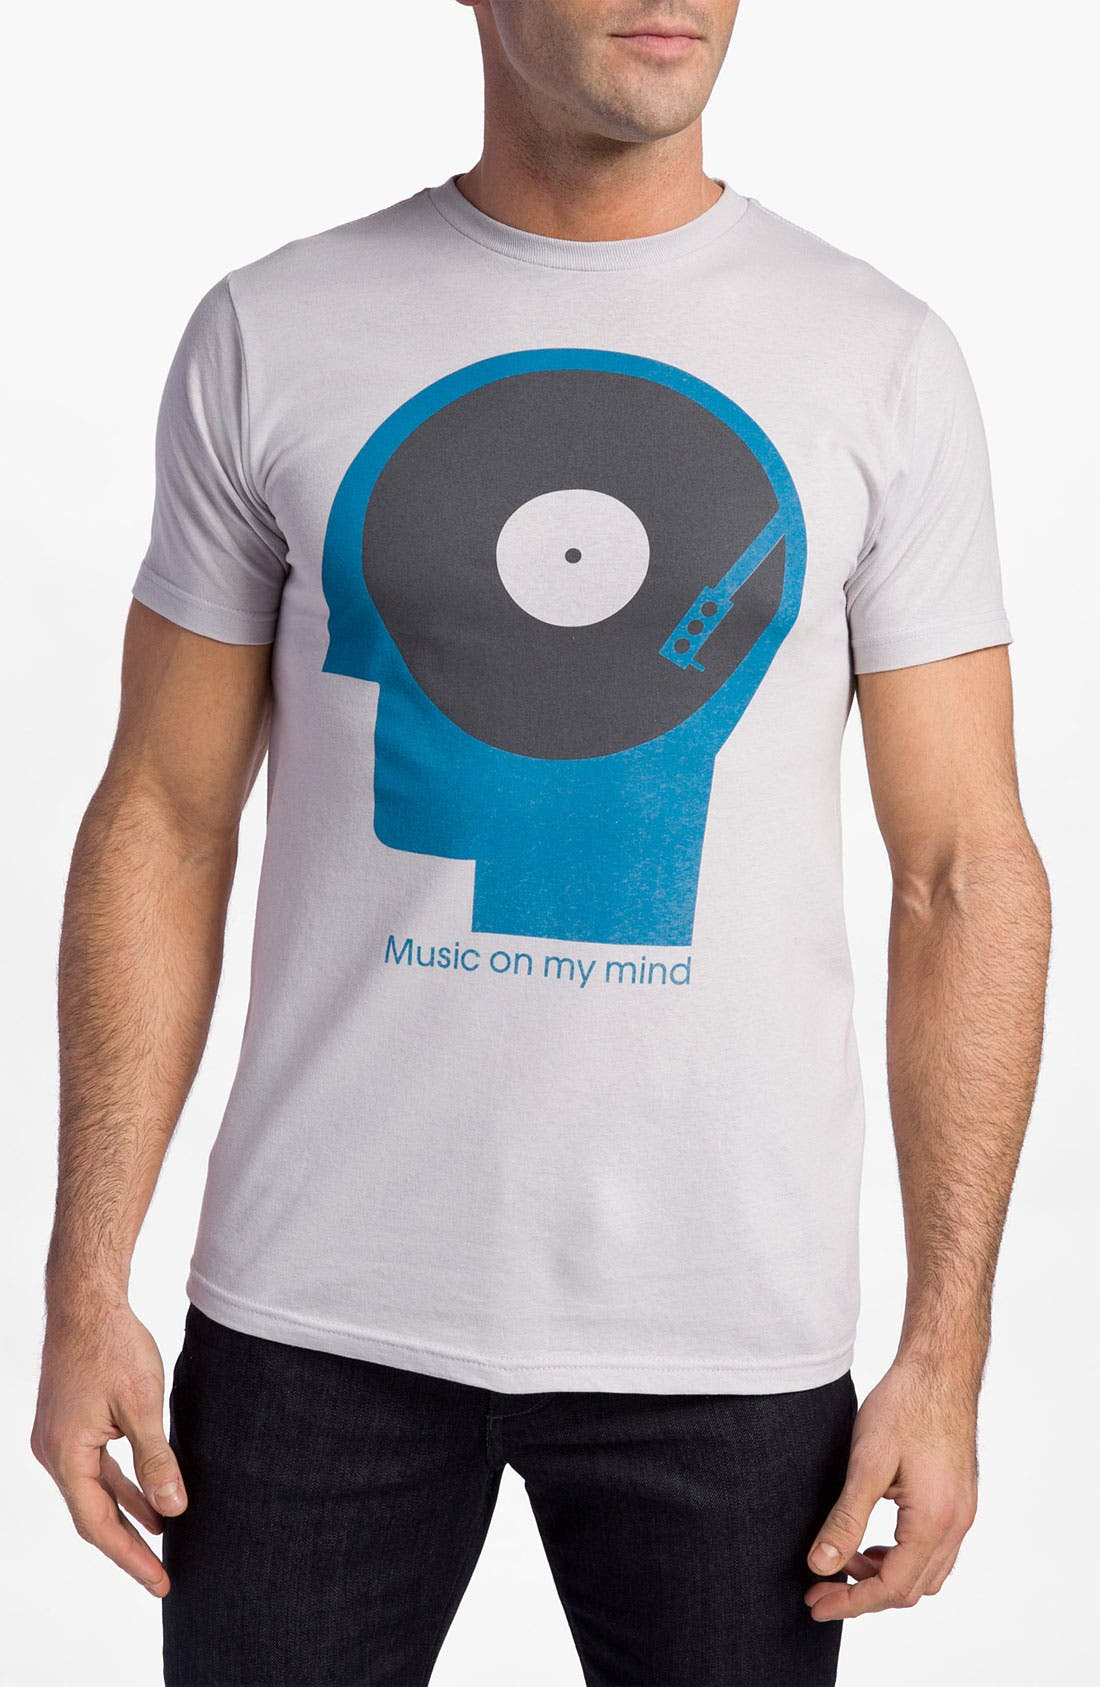 Alternate Image 1 Selected - PalmerCash 'Music on My Mind' T-Shirt